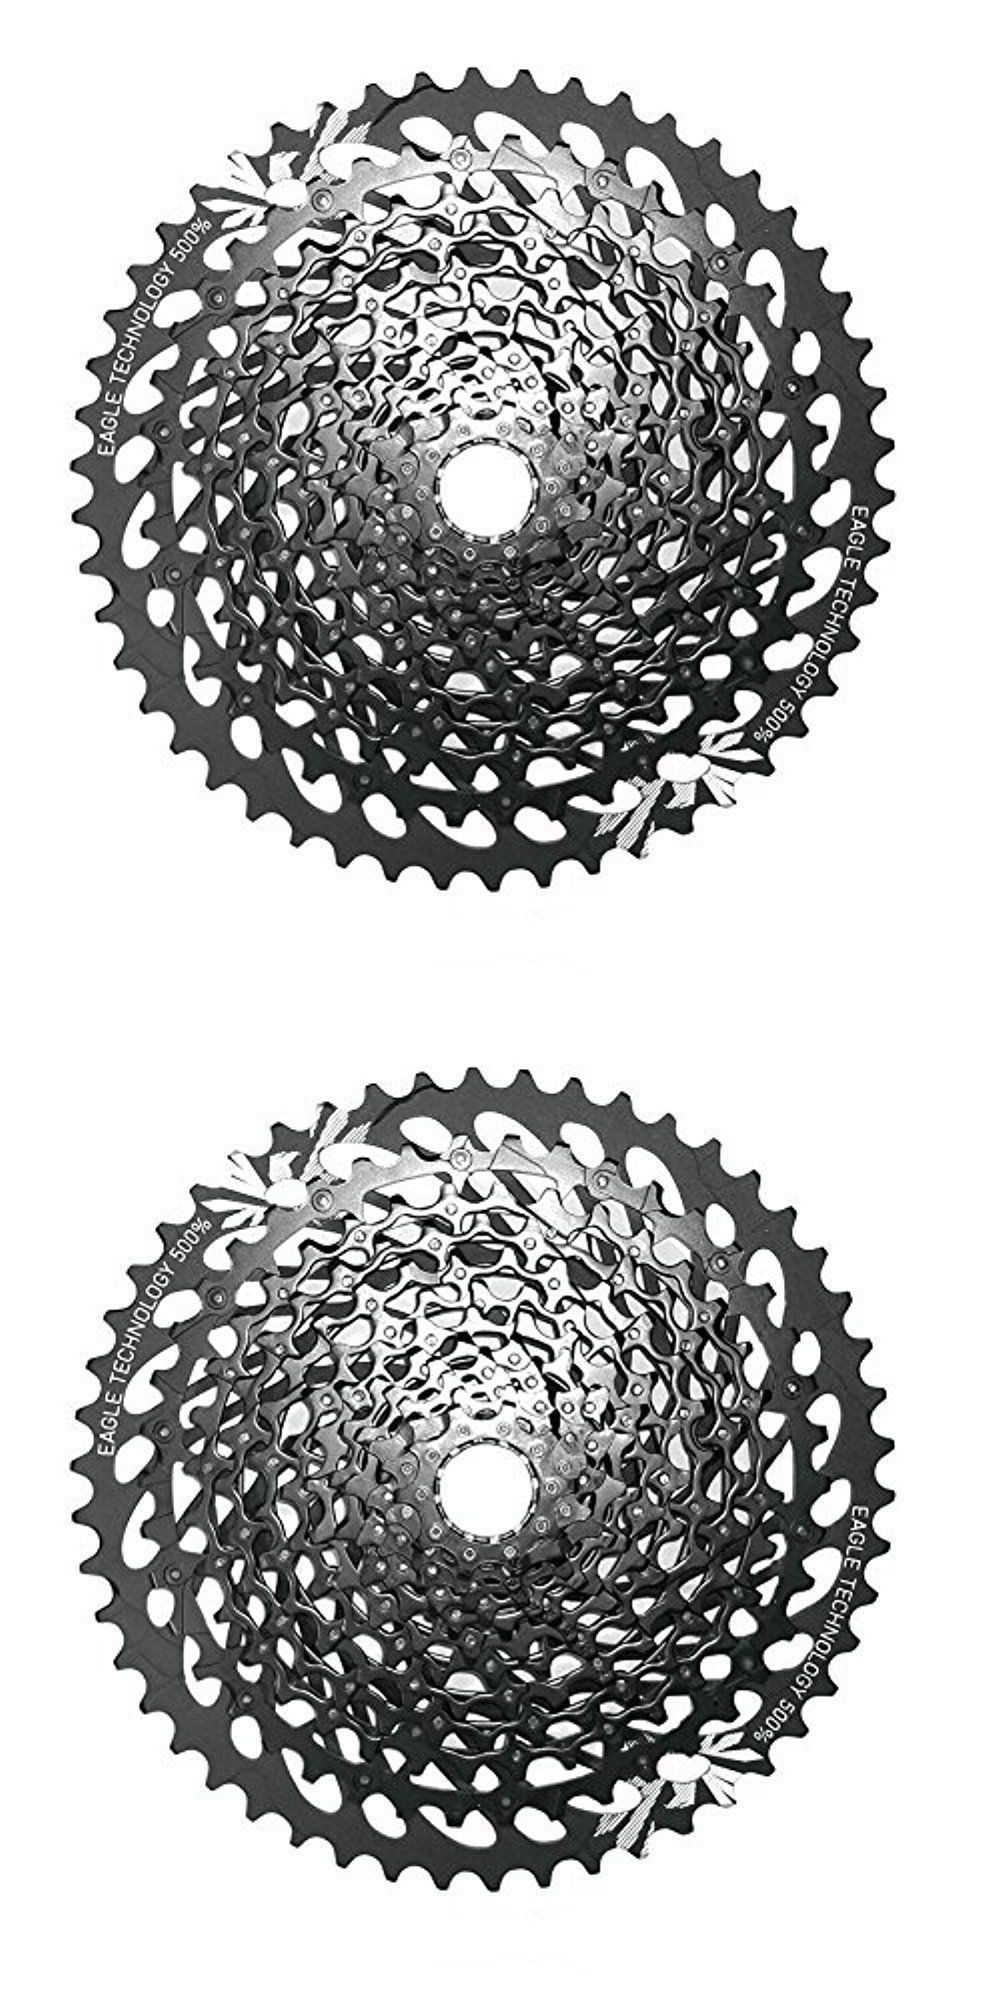 373cf337423 Cassettes Freewheels and Cogs 177809  Sram Xg-1275 Gx Eagle 12-Speed Mtb  Mountain Bike Cassette Black